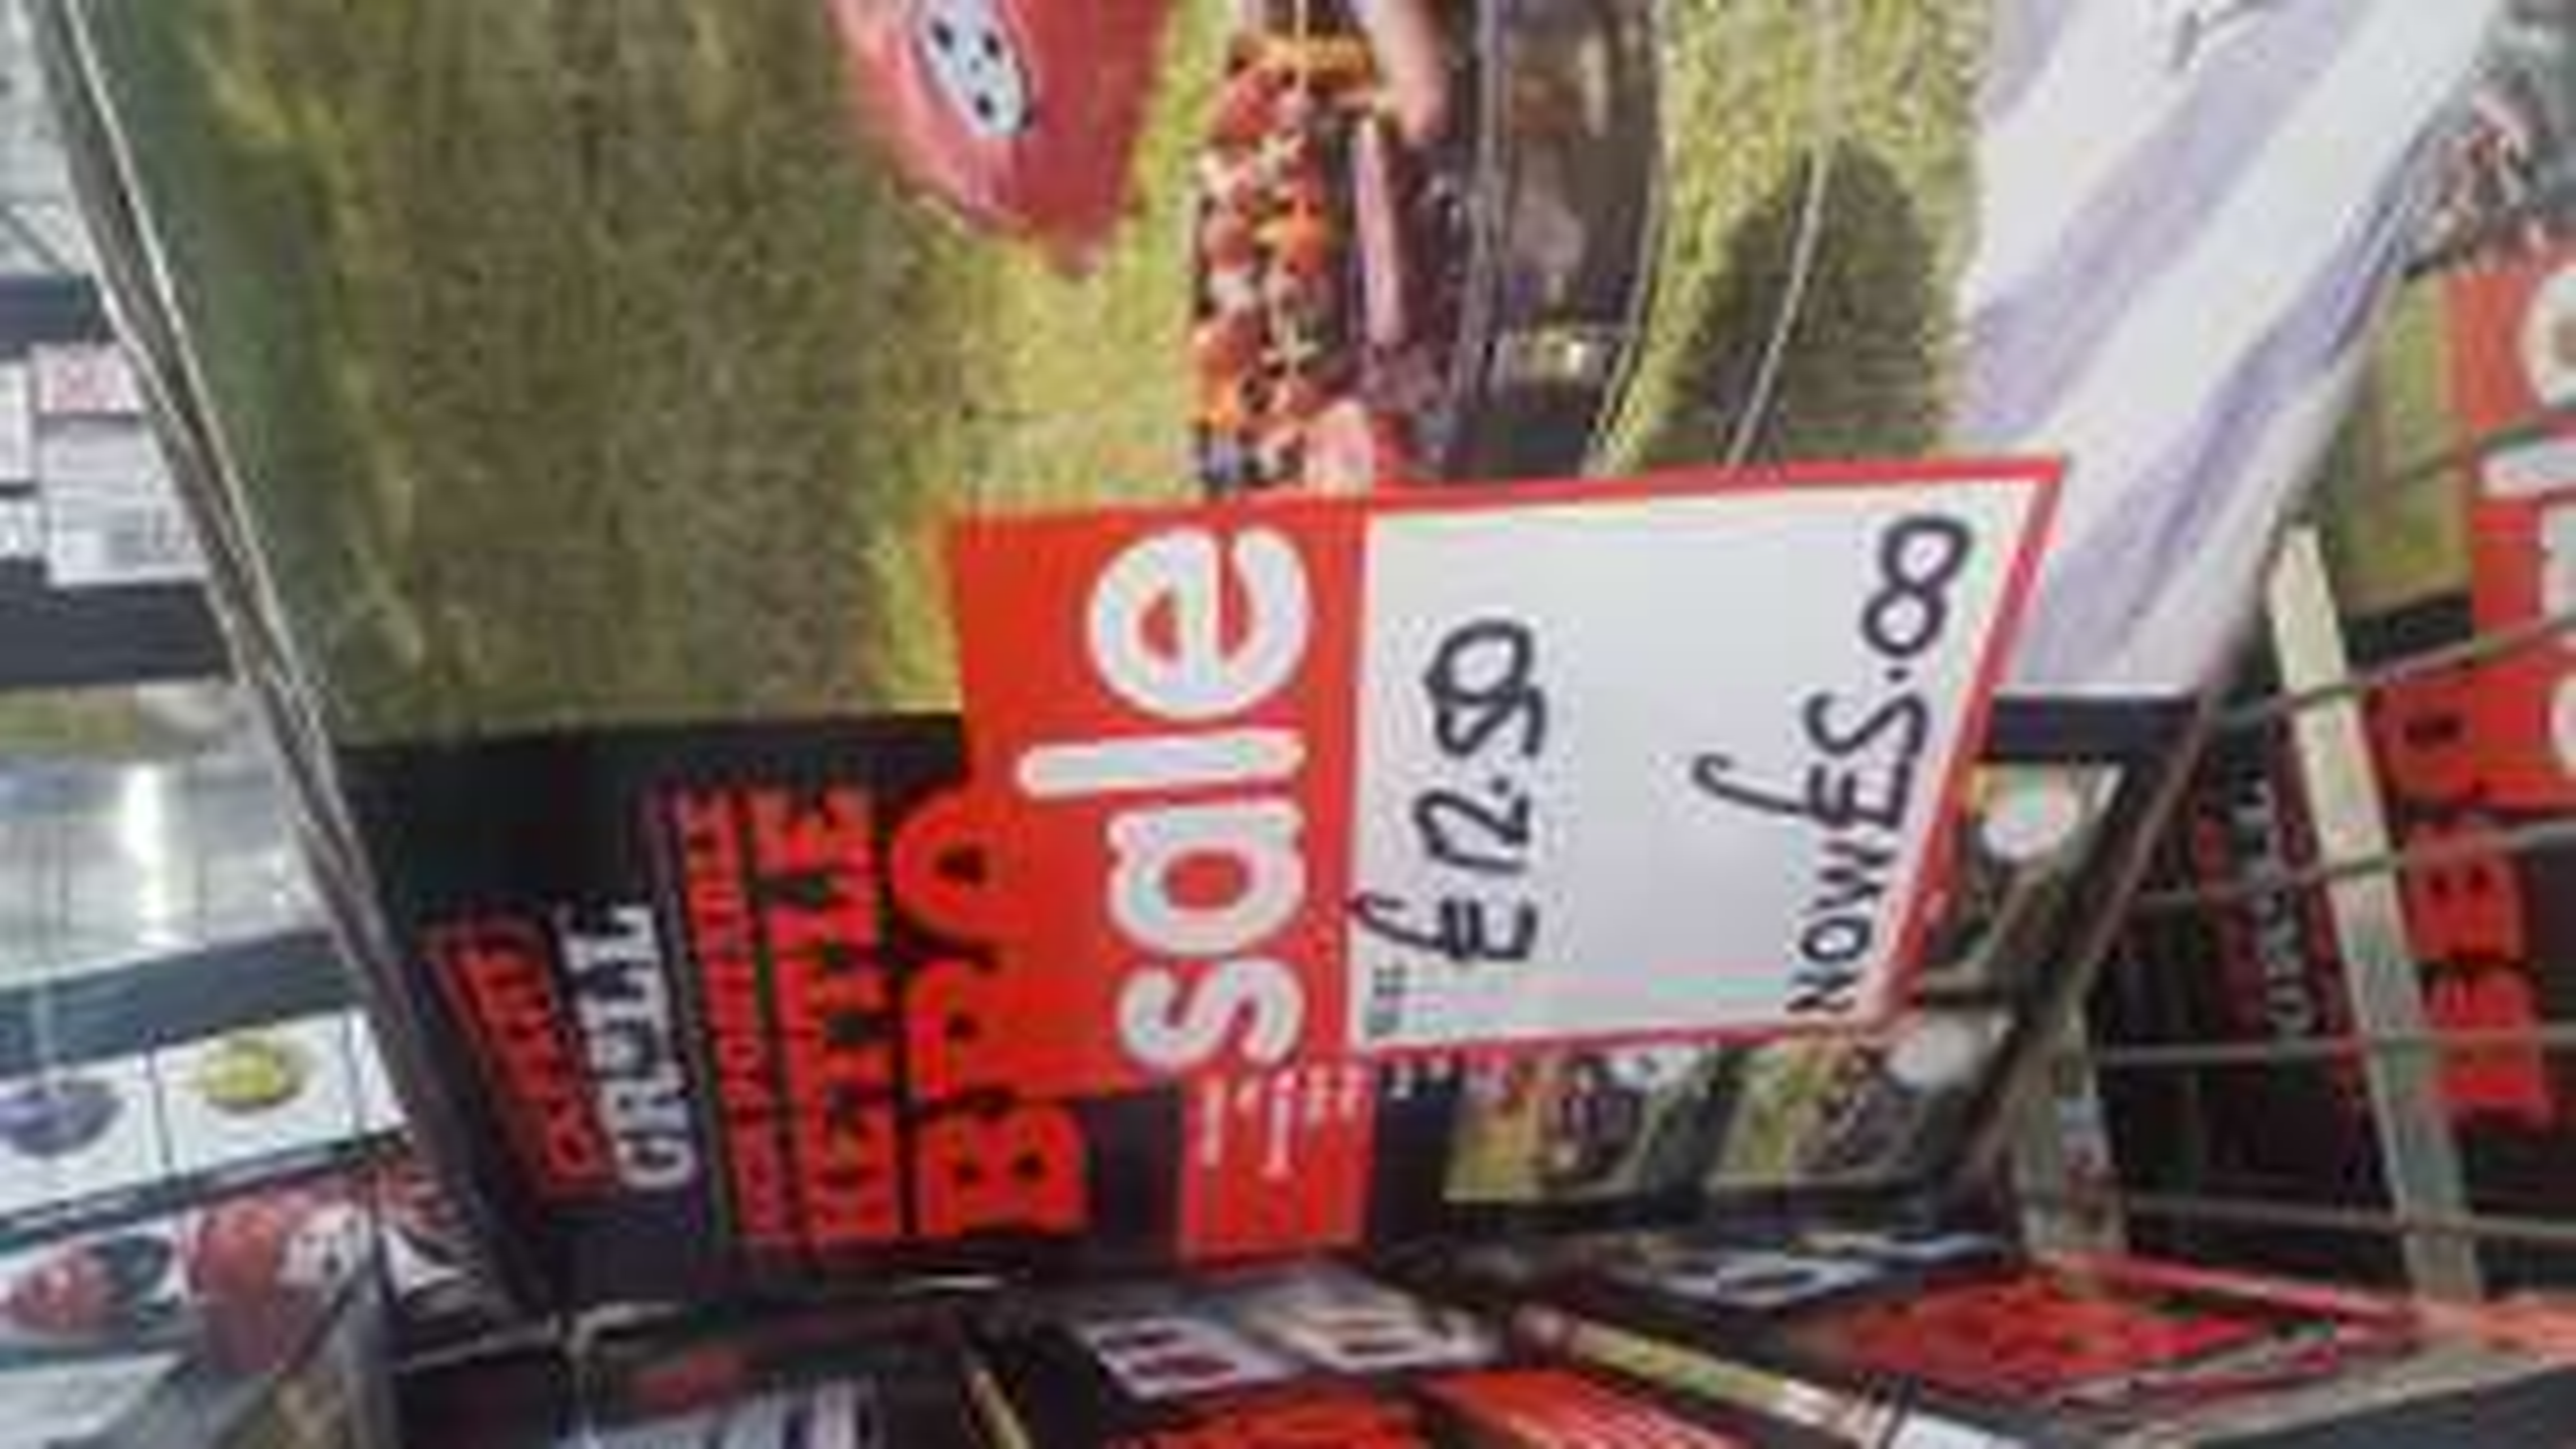 Portable kettle BBQ Asda Basingstoke £5